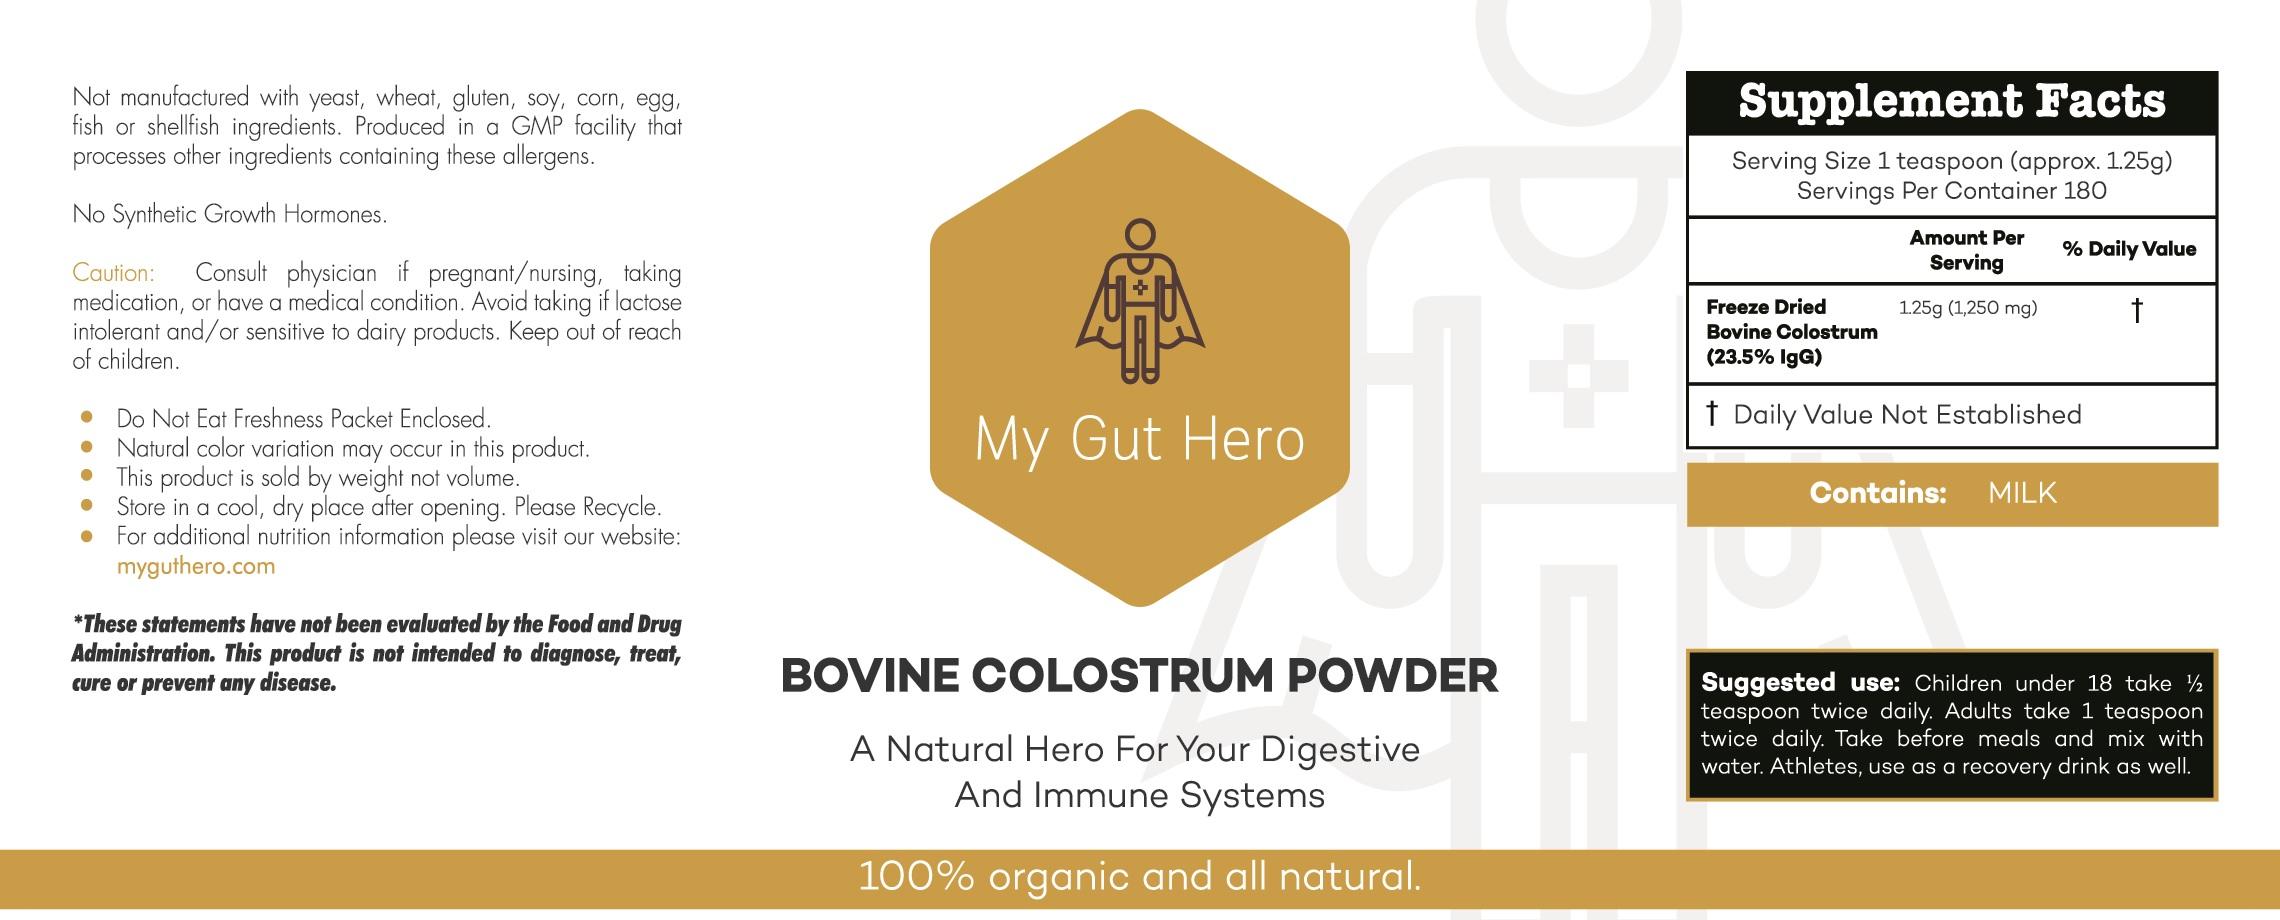 Organic Bovine Colostrum flat label-large